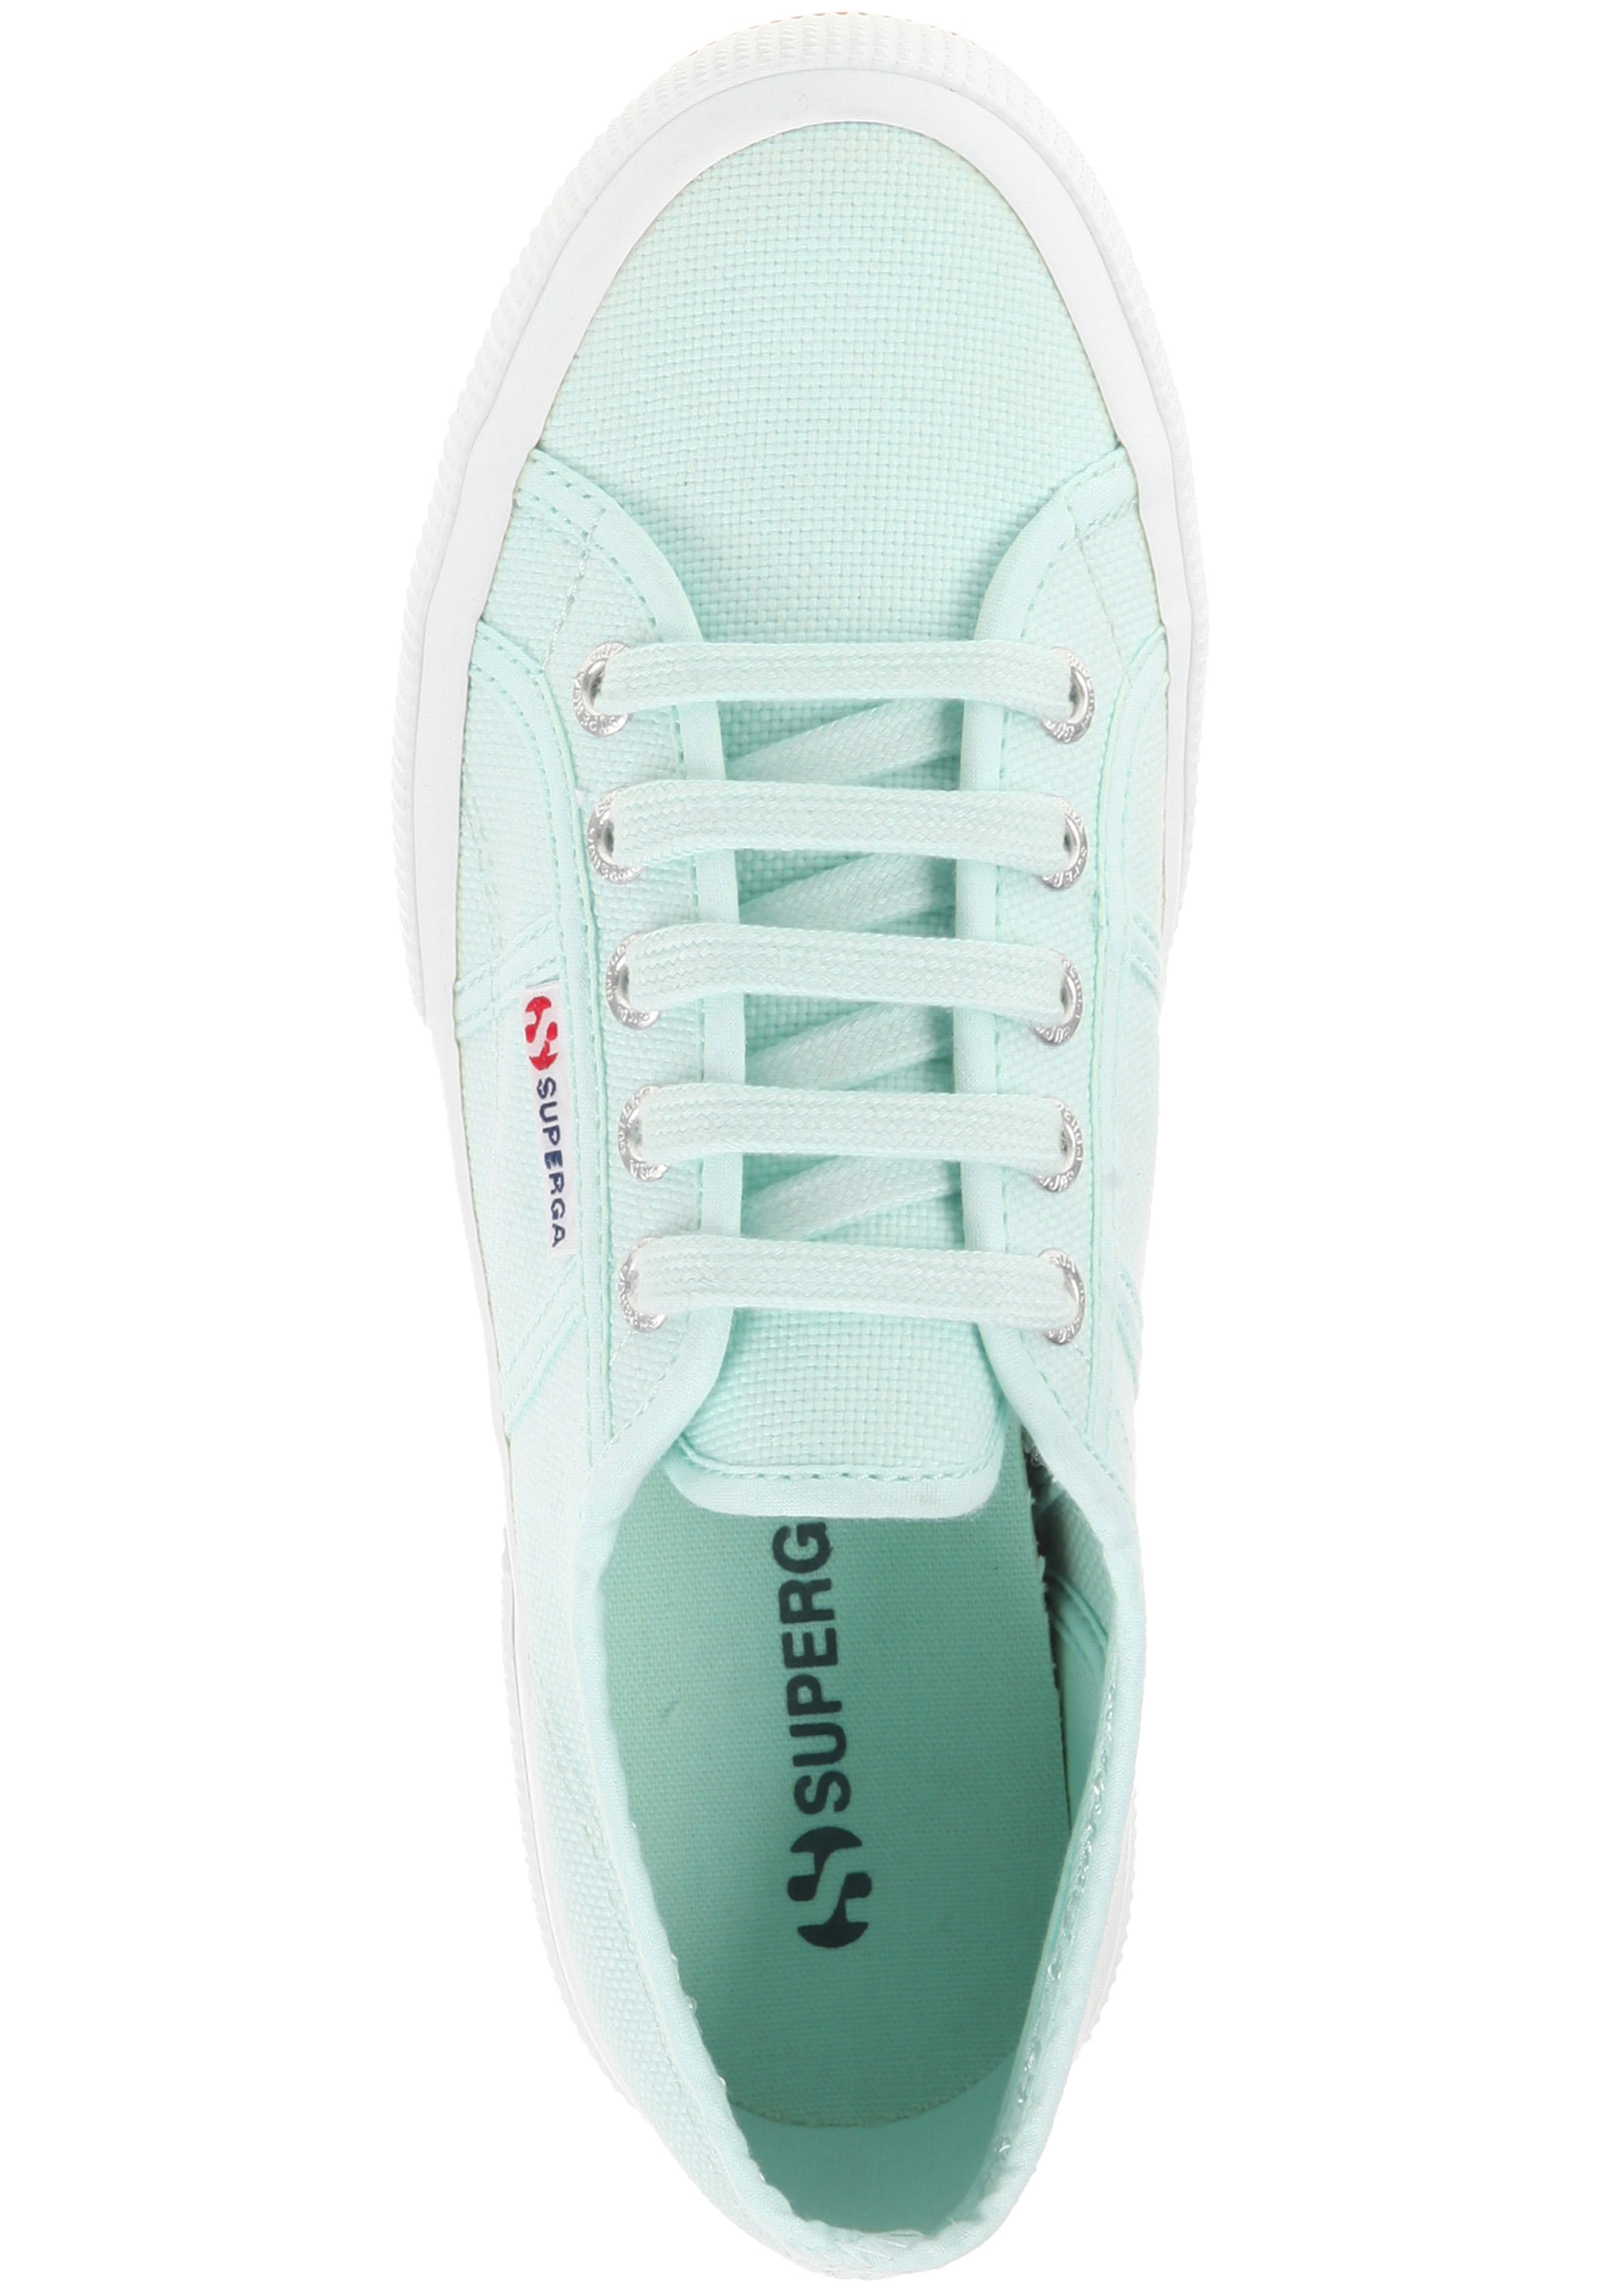 Classic' In 'cotu Pastellgrün Sneaker Superga X8nwOP0k